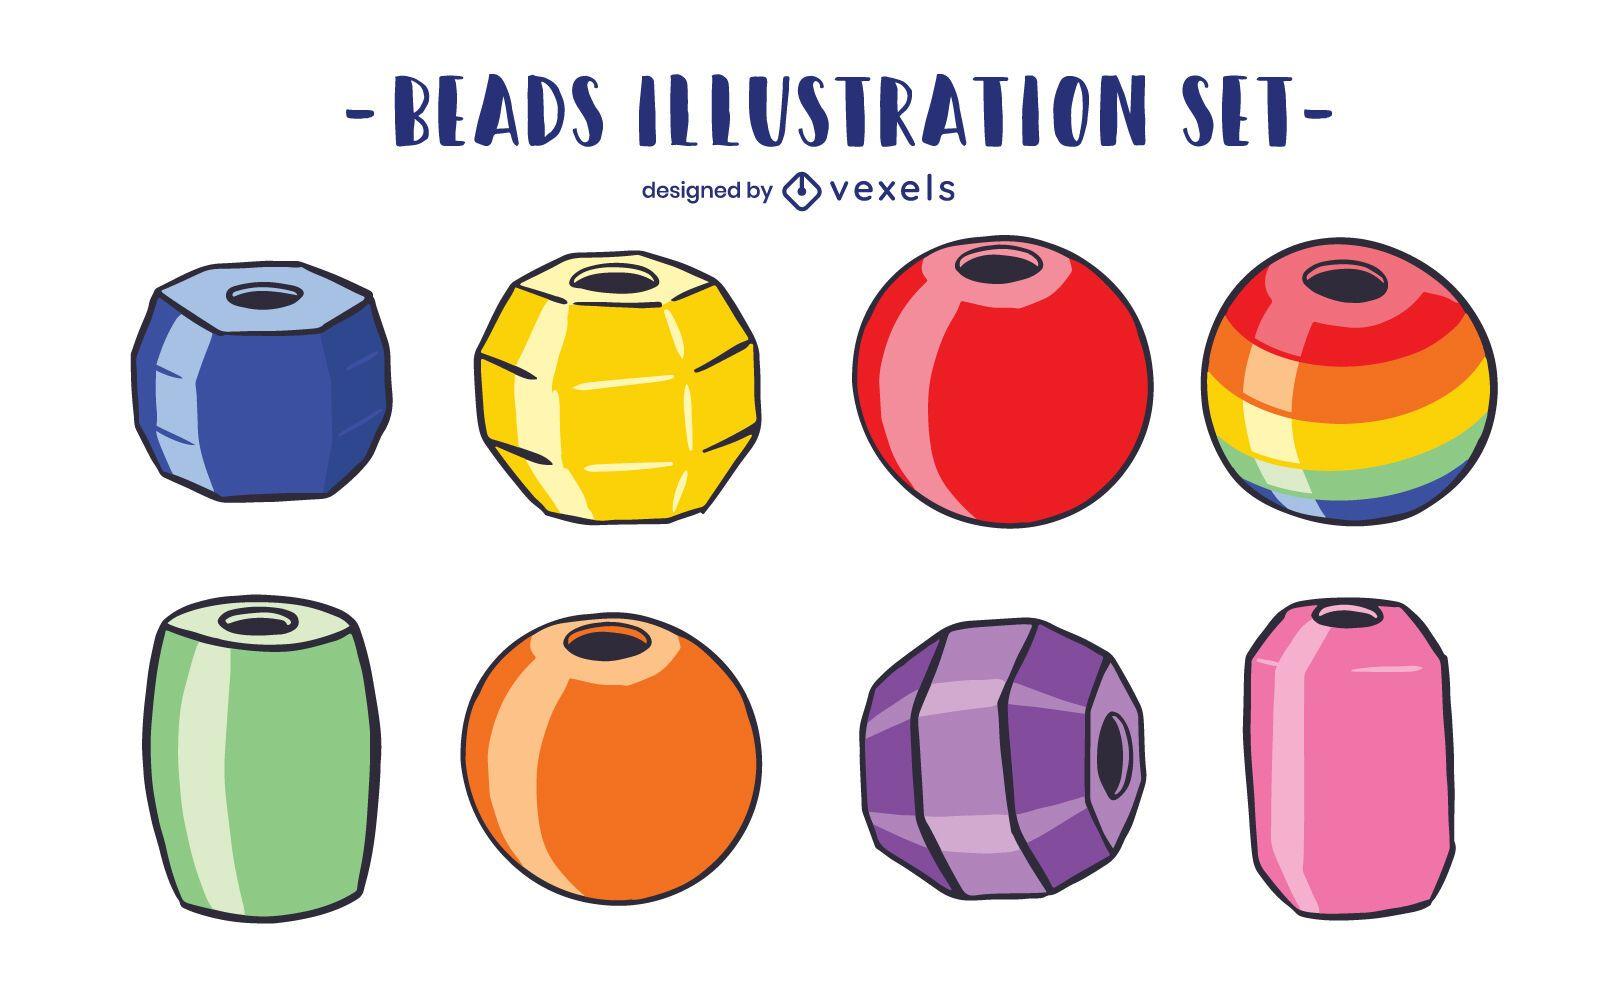 Beads illustration set